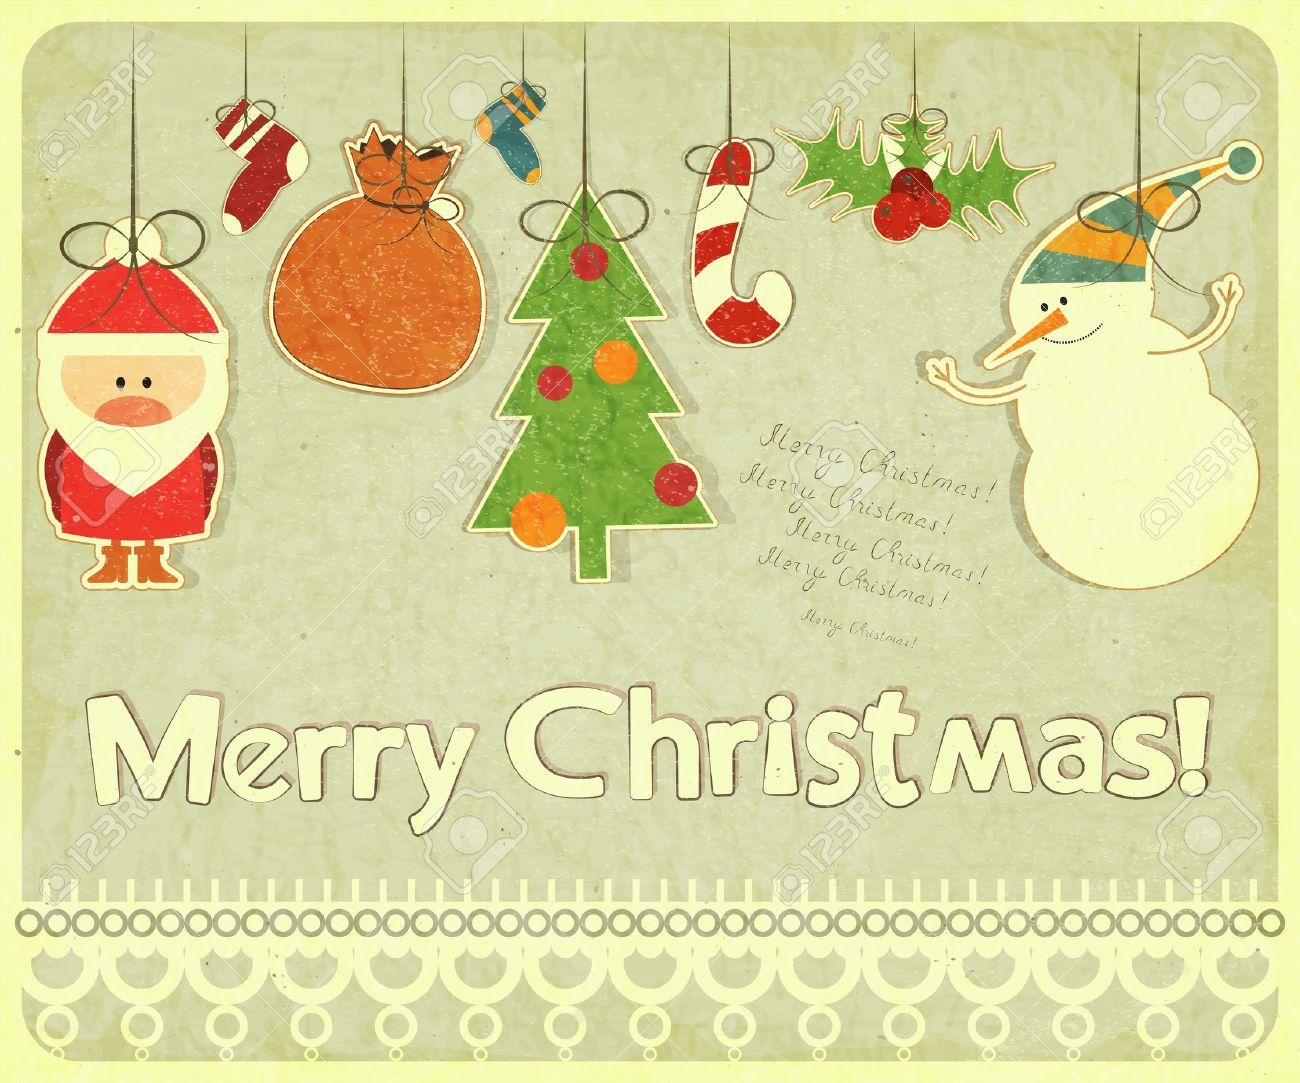 Old Christmas Postcard With Christmas-tree Decorations. Santa ...